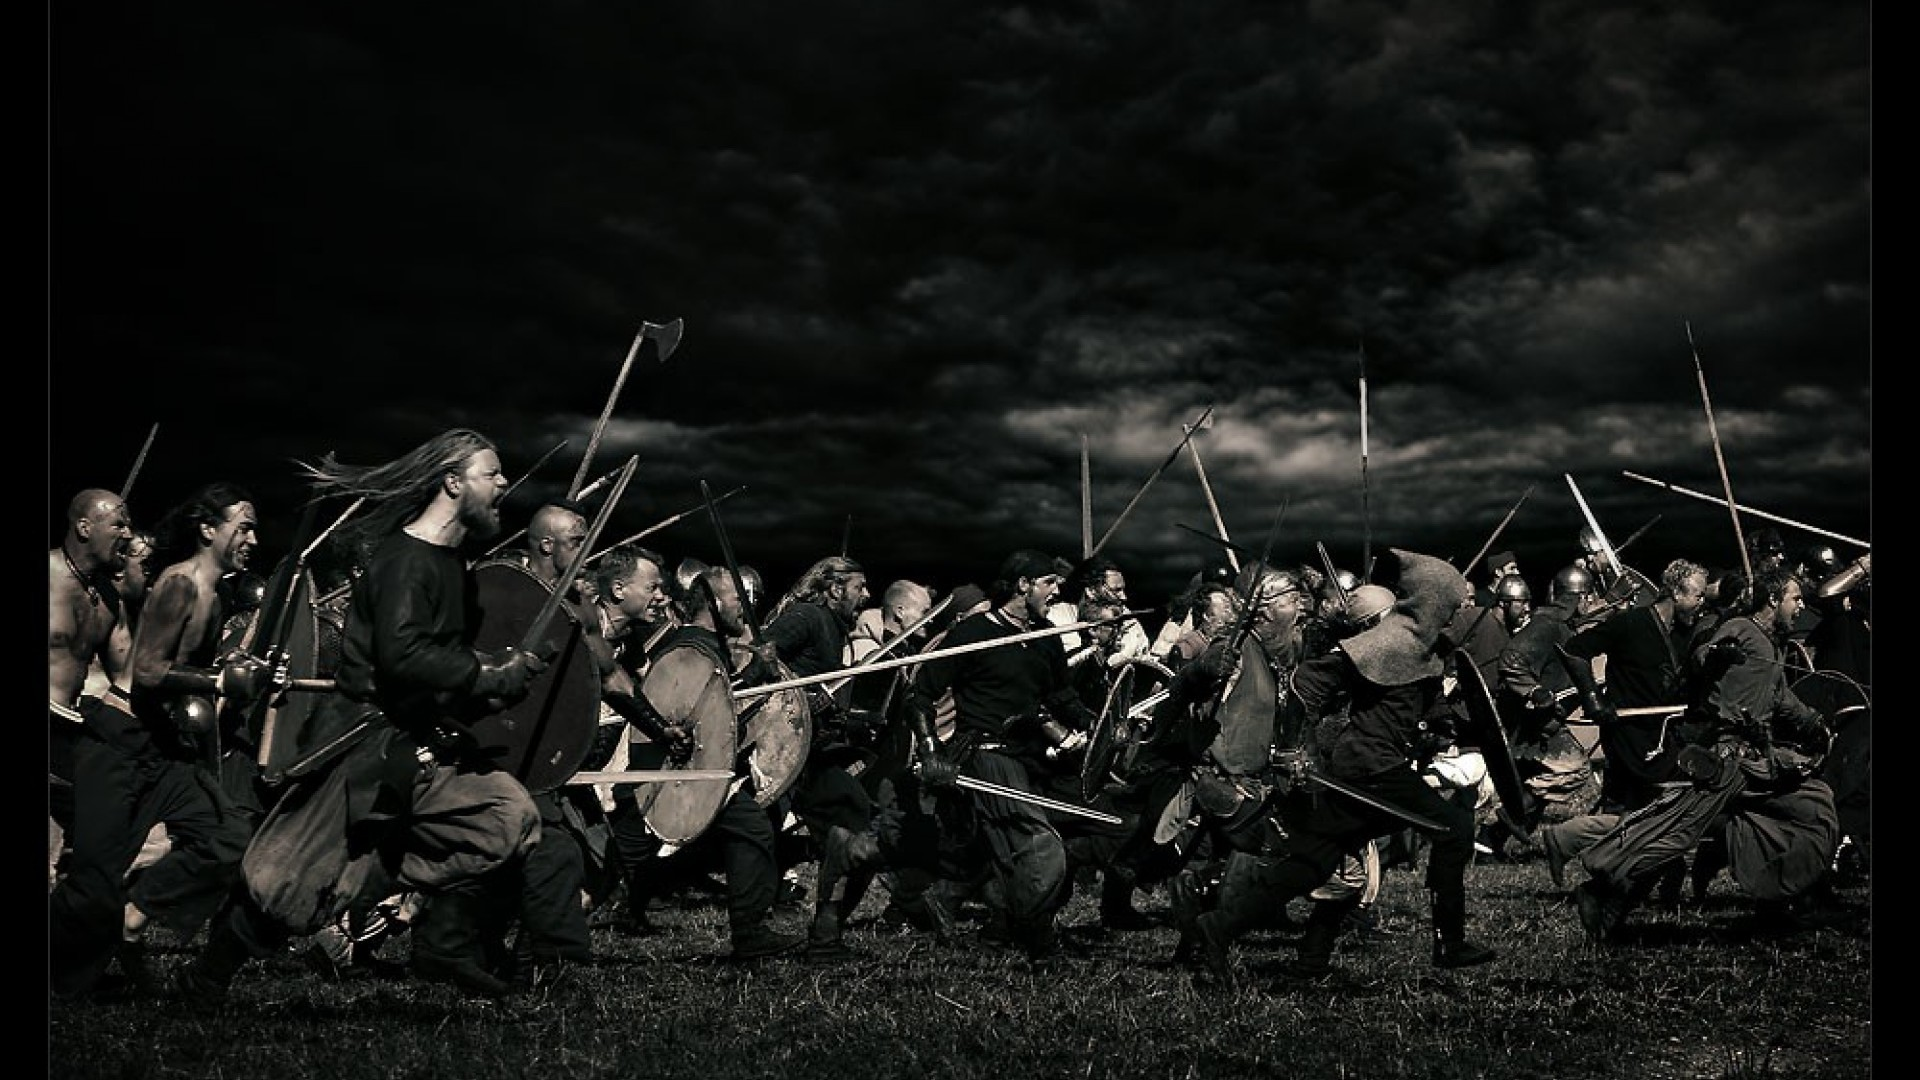 Games: Skarin Viking Battle Asgard Vikings Wallpaper For Desktop 1680×1050 Viking  Wallpapers HD